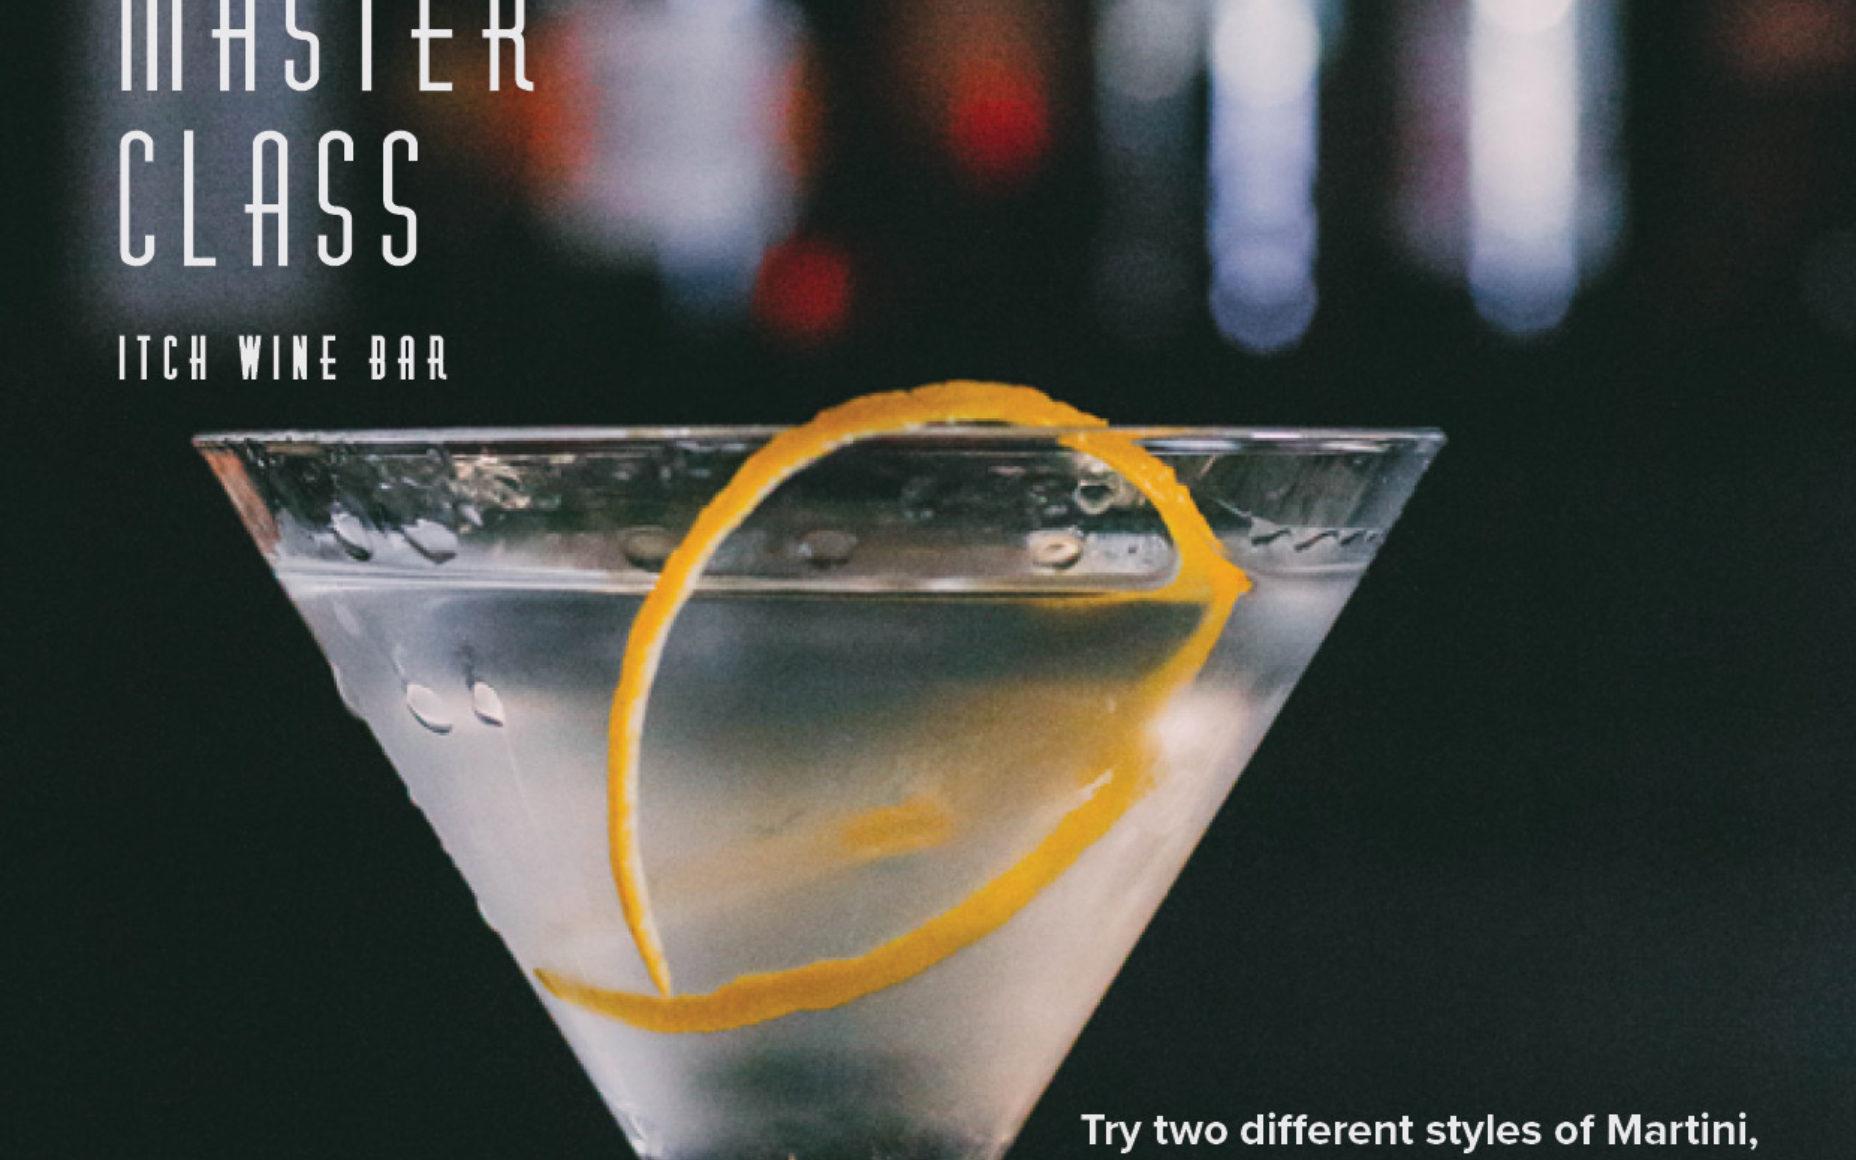 Itch J001668 Martini Event June 19